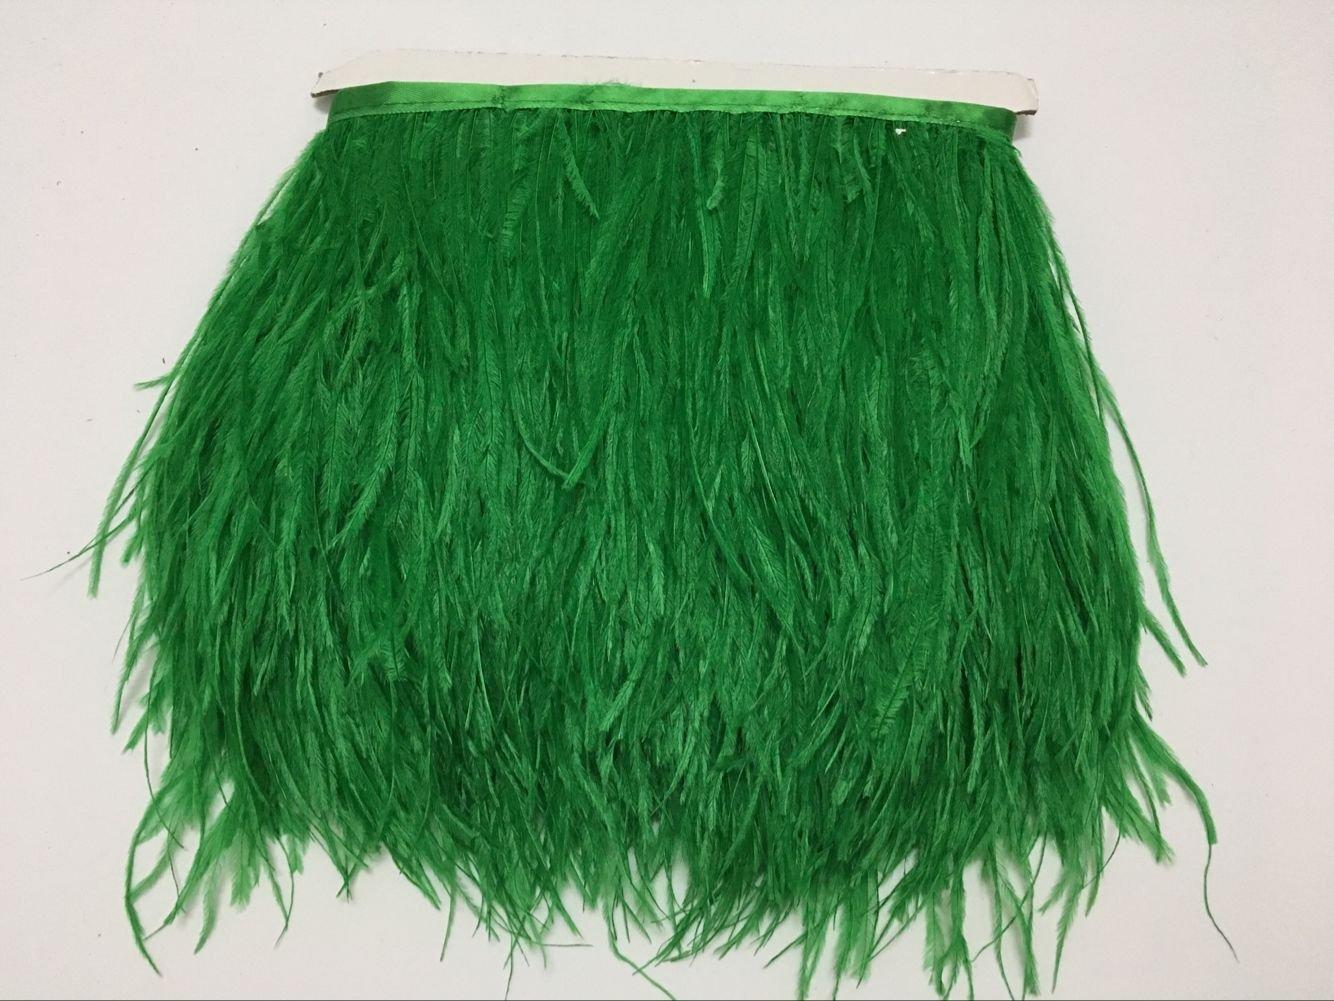 MELADY 10 Yards Fashion Dress Sewing Crafts Costumes Decoration Ostrich Feathers Trims Fringe with Satin Ribbon Tape Orange